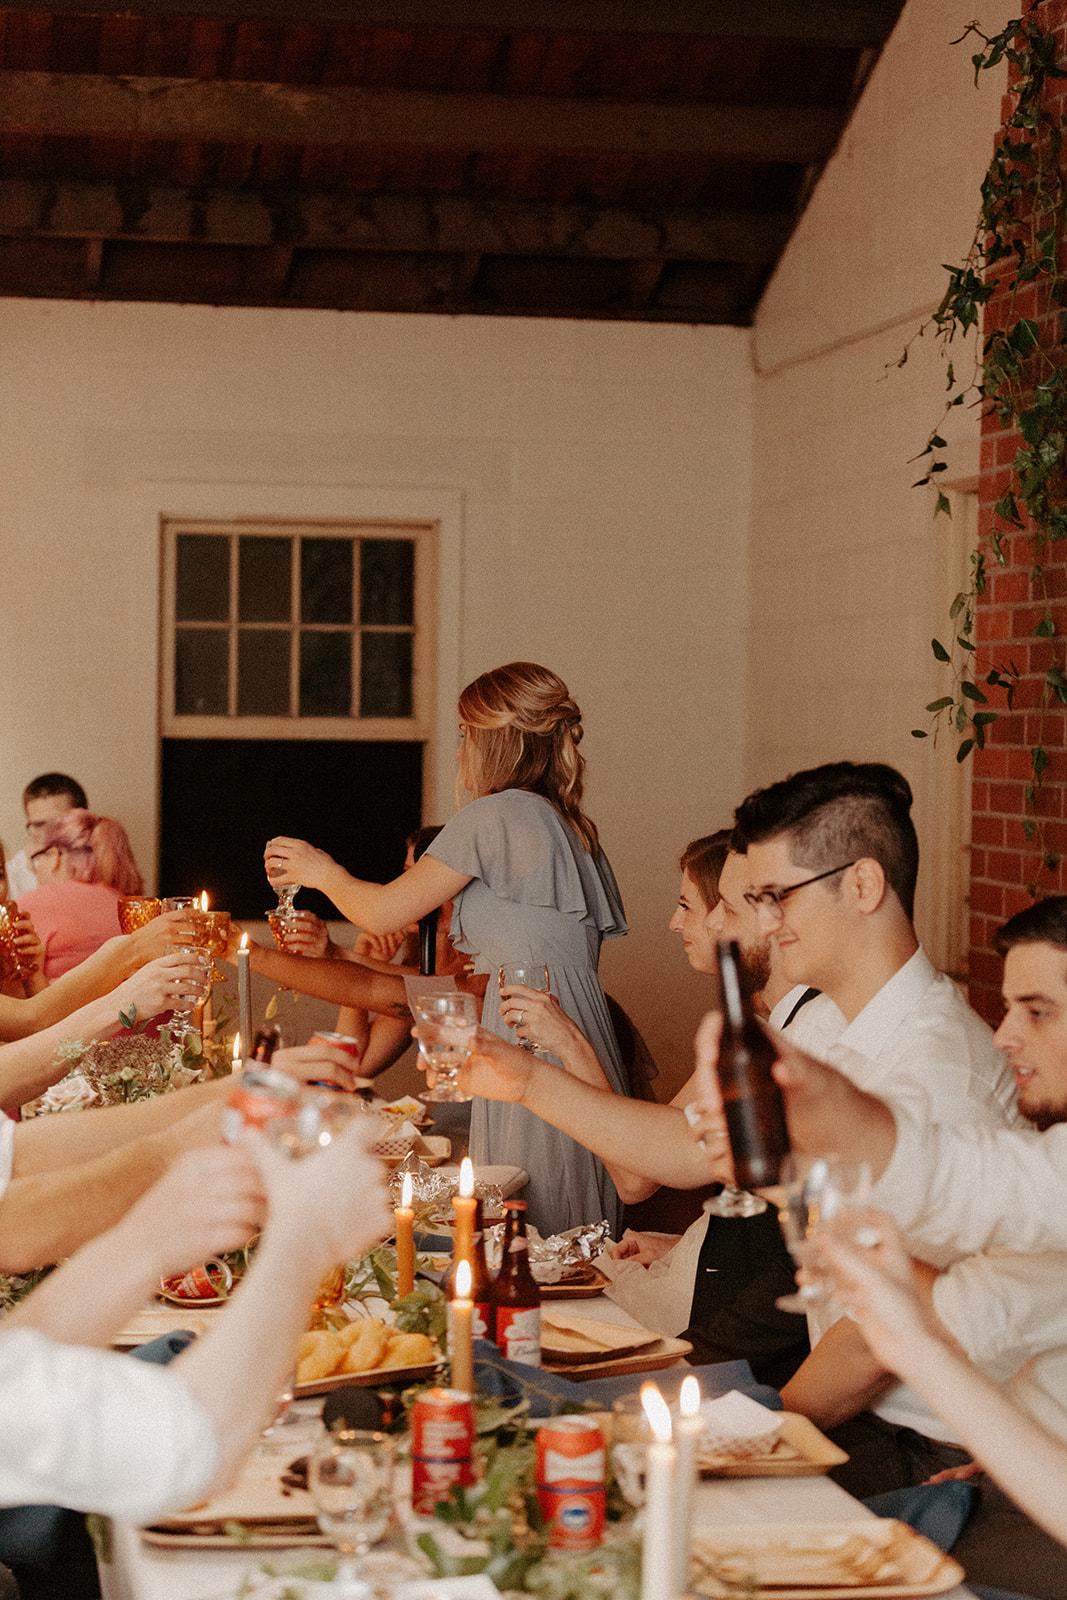 camp_wokanda_peoria_illinois_wedding_photographer_wright_photographs_bliese_0957.jpg